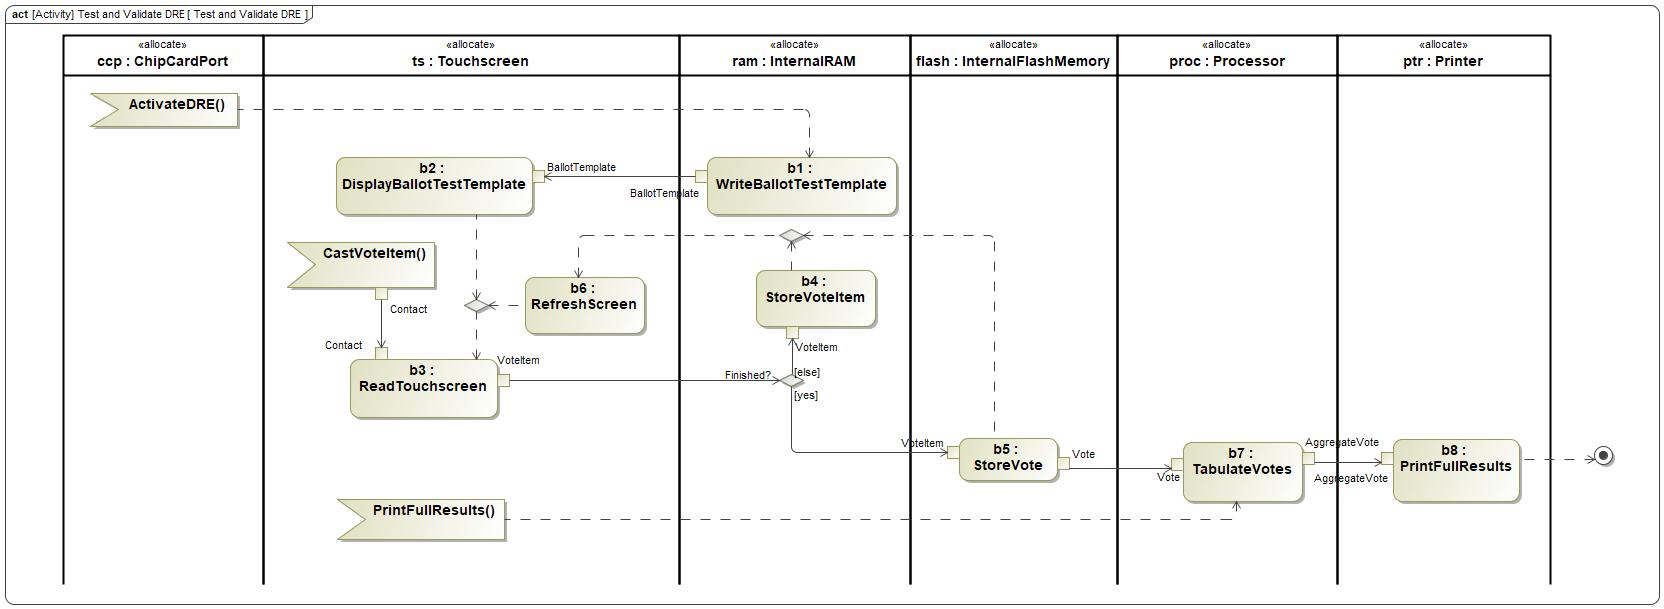 Sysml Activity Diagram Trusted Wiring Diagrams Astahinternalblockdiagramblockpng Intercax Swimlane